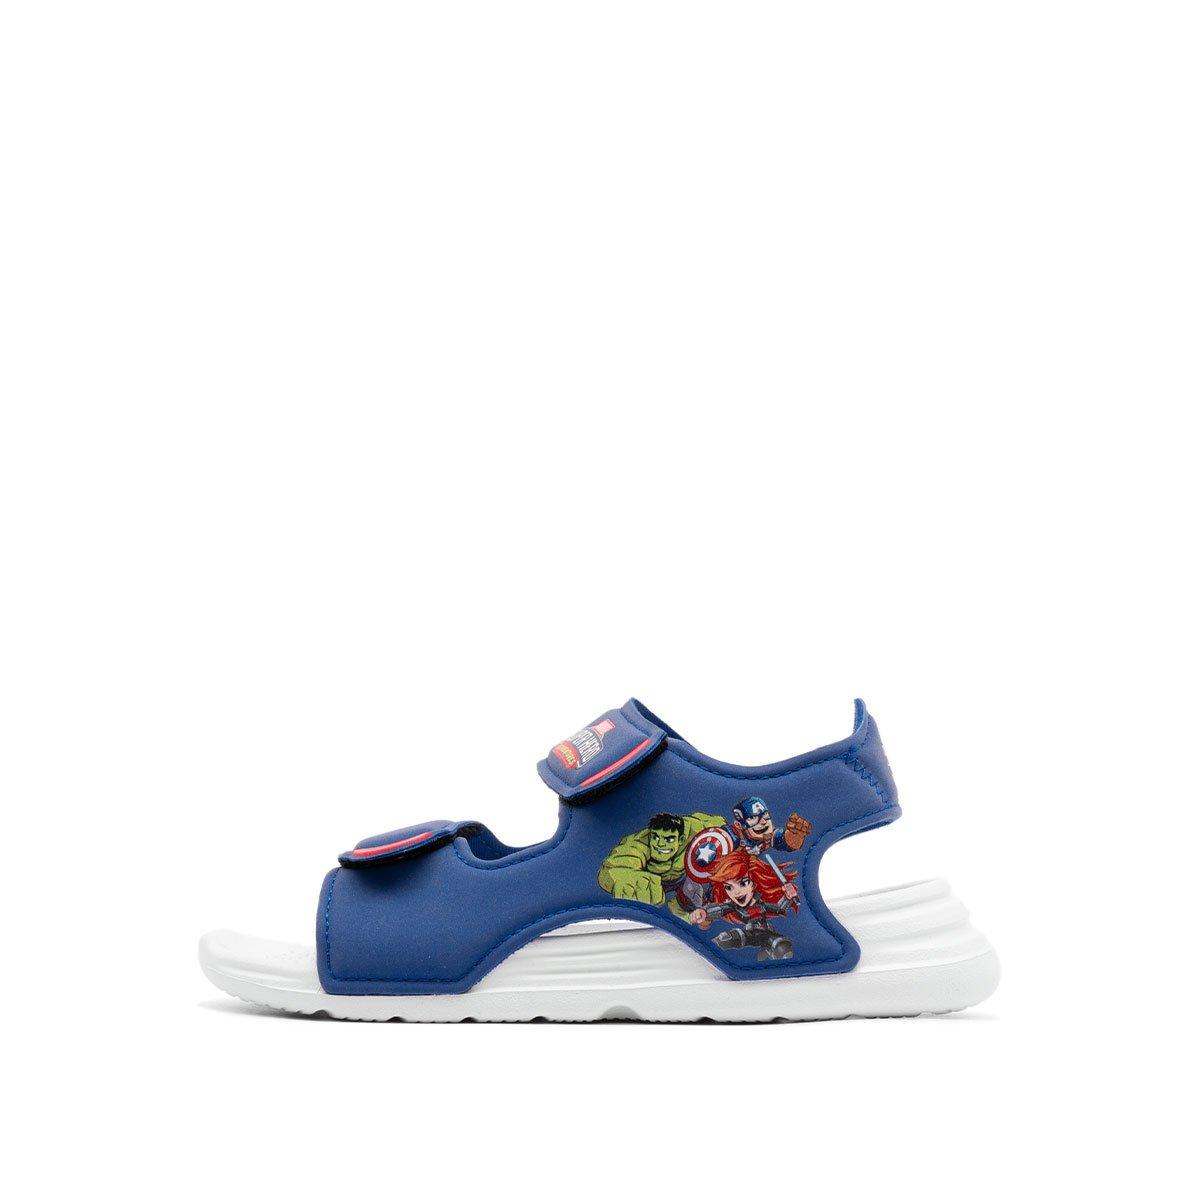 Adidas Swim Sandal C